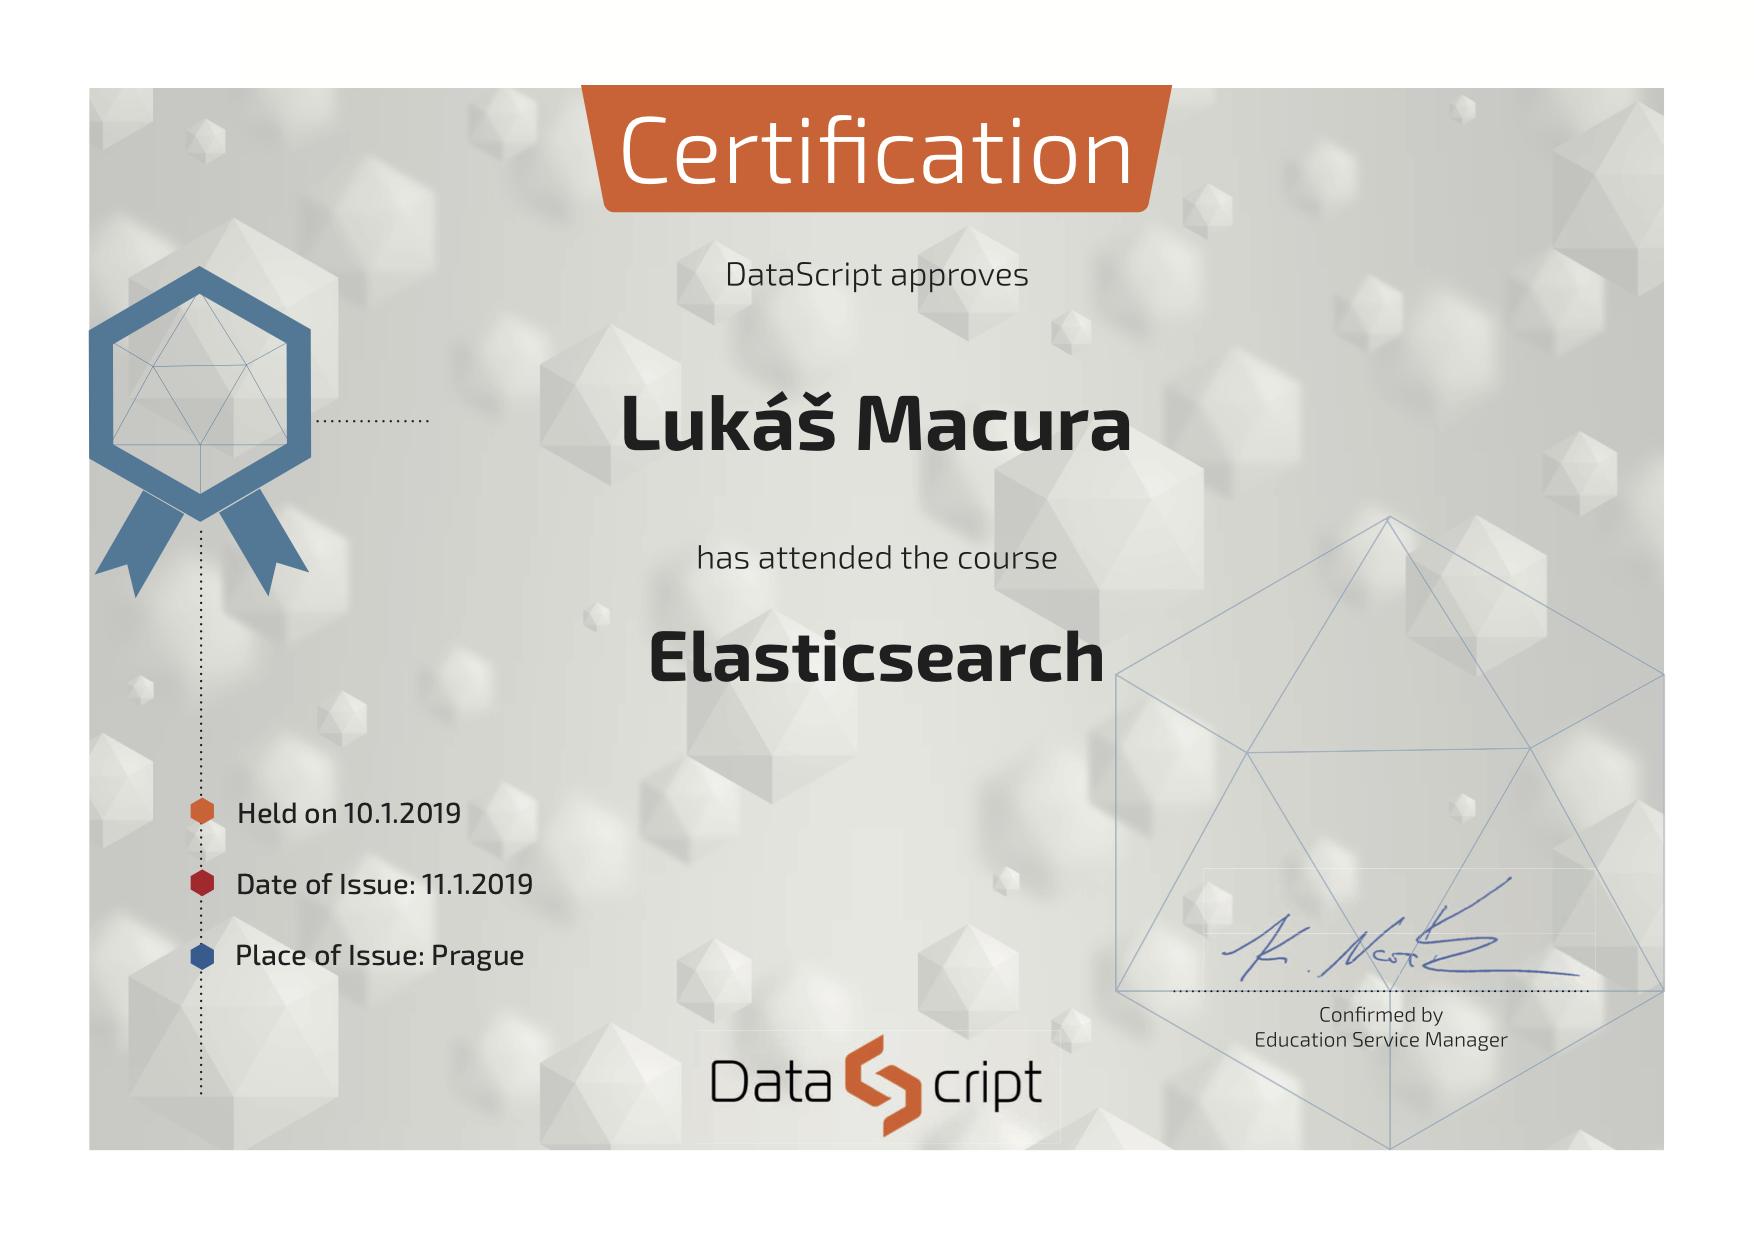 DS_certifikat_LukasMacura.png